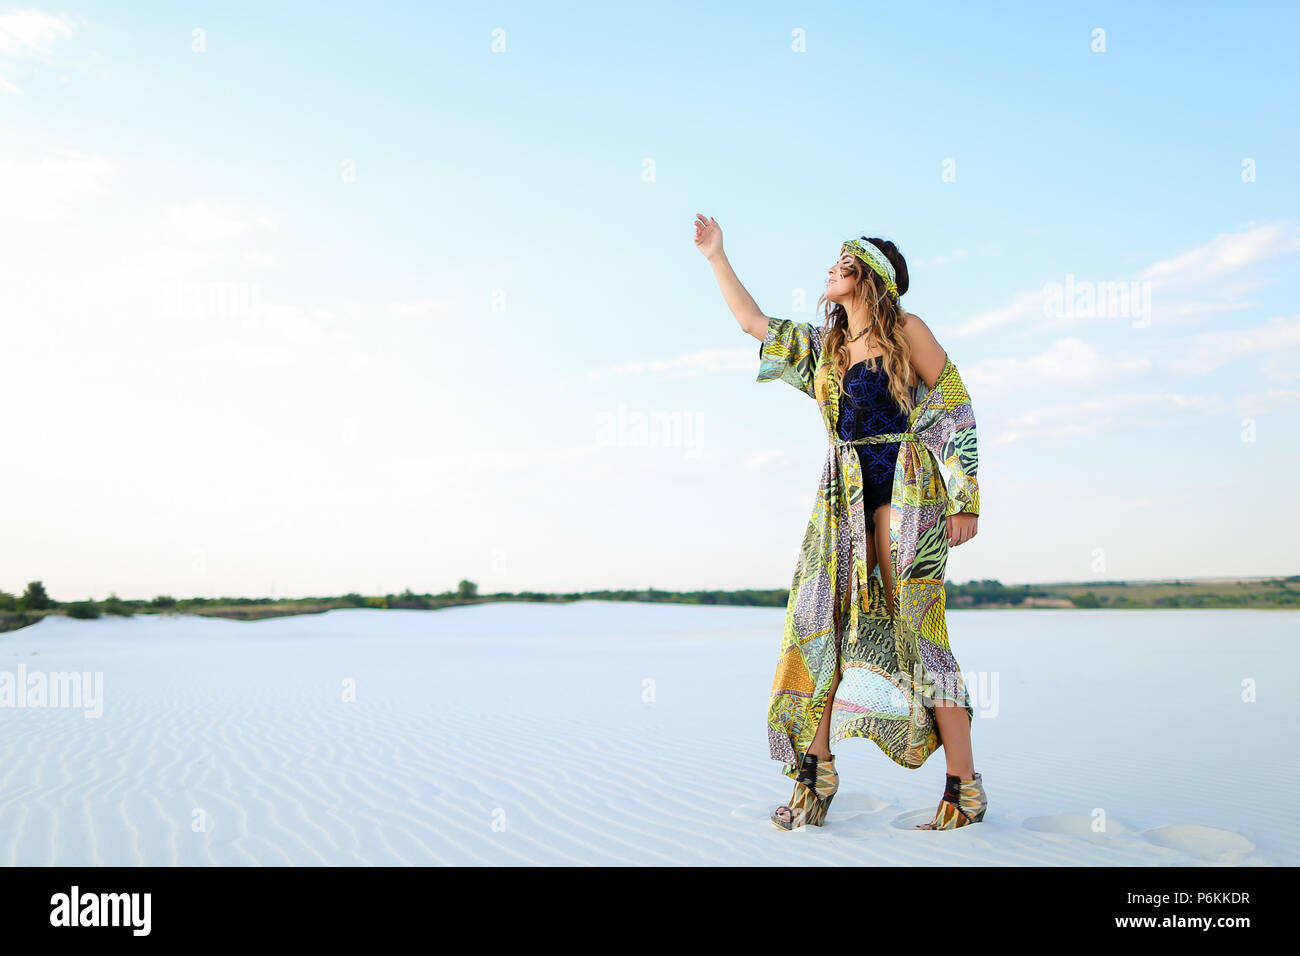 Caucasian stylish female photo model with raised hand wearing bl - Stock Image